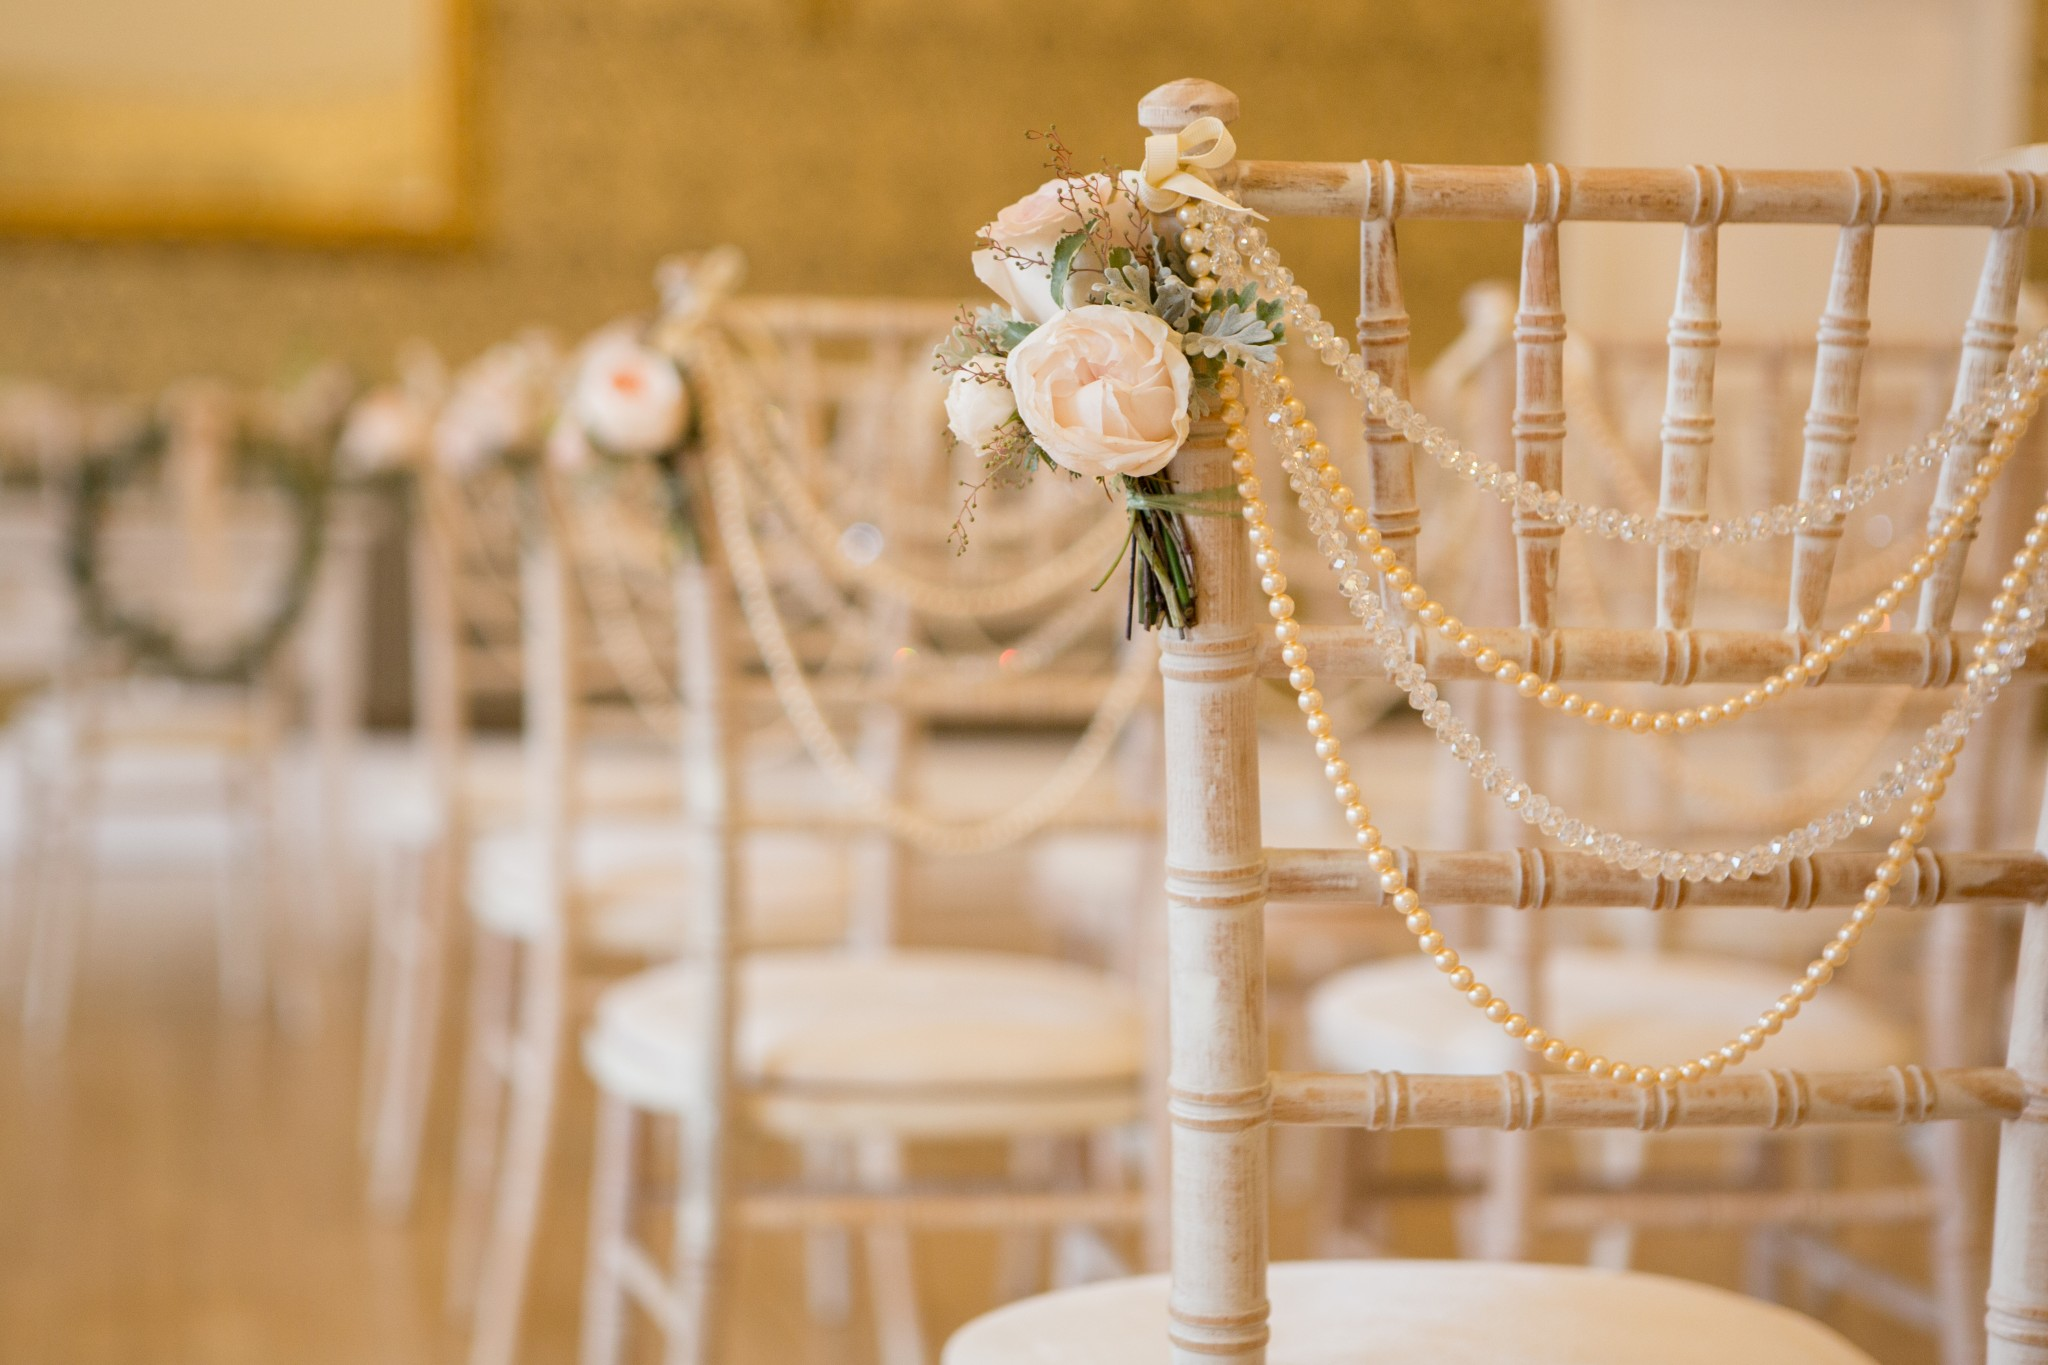 evoke-pictures-wedding-photographer_clifton-pavilion_060